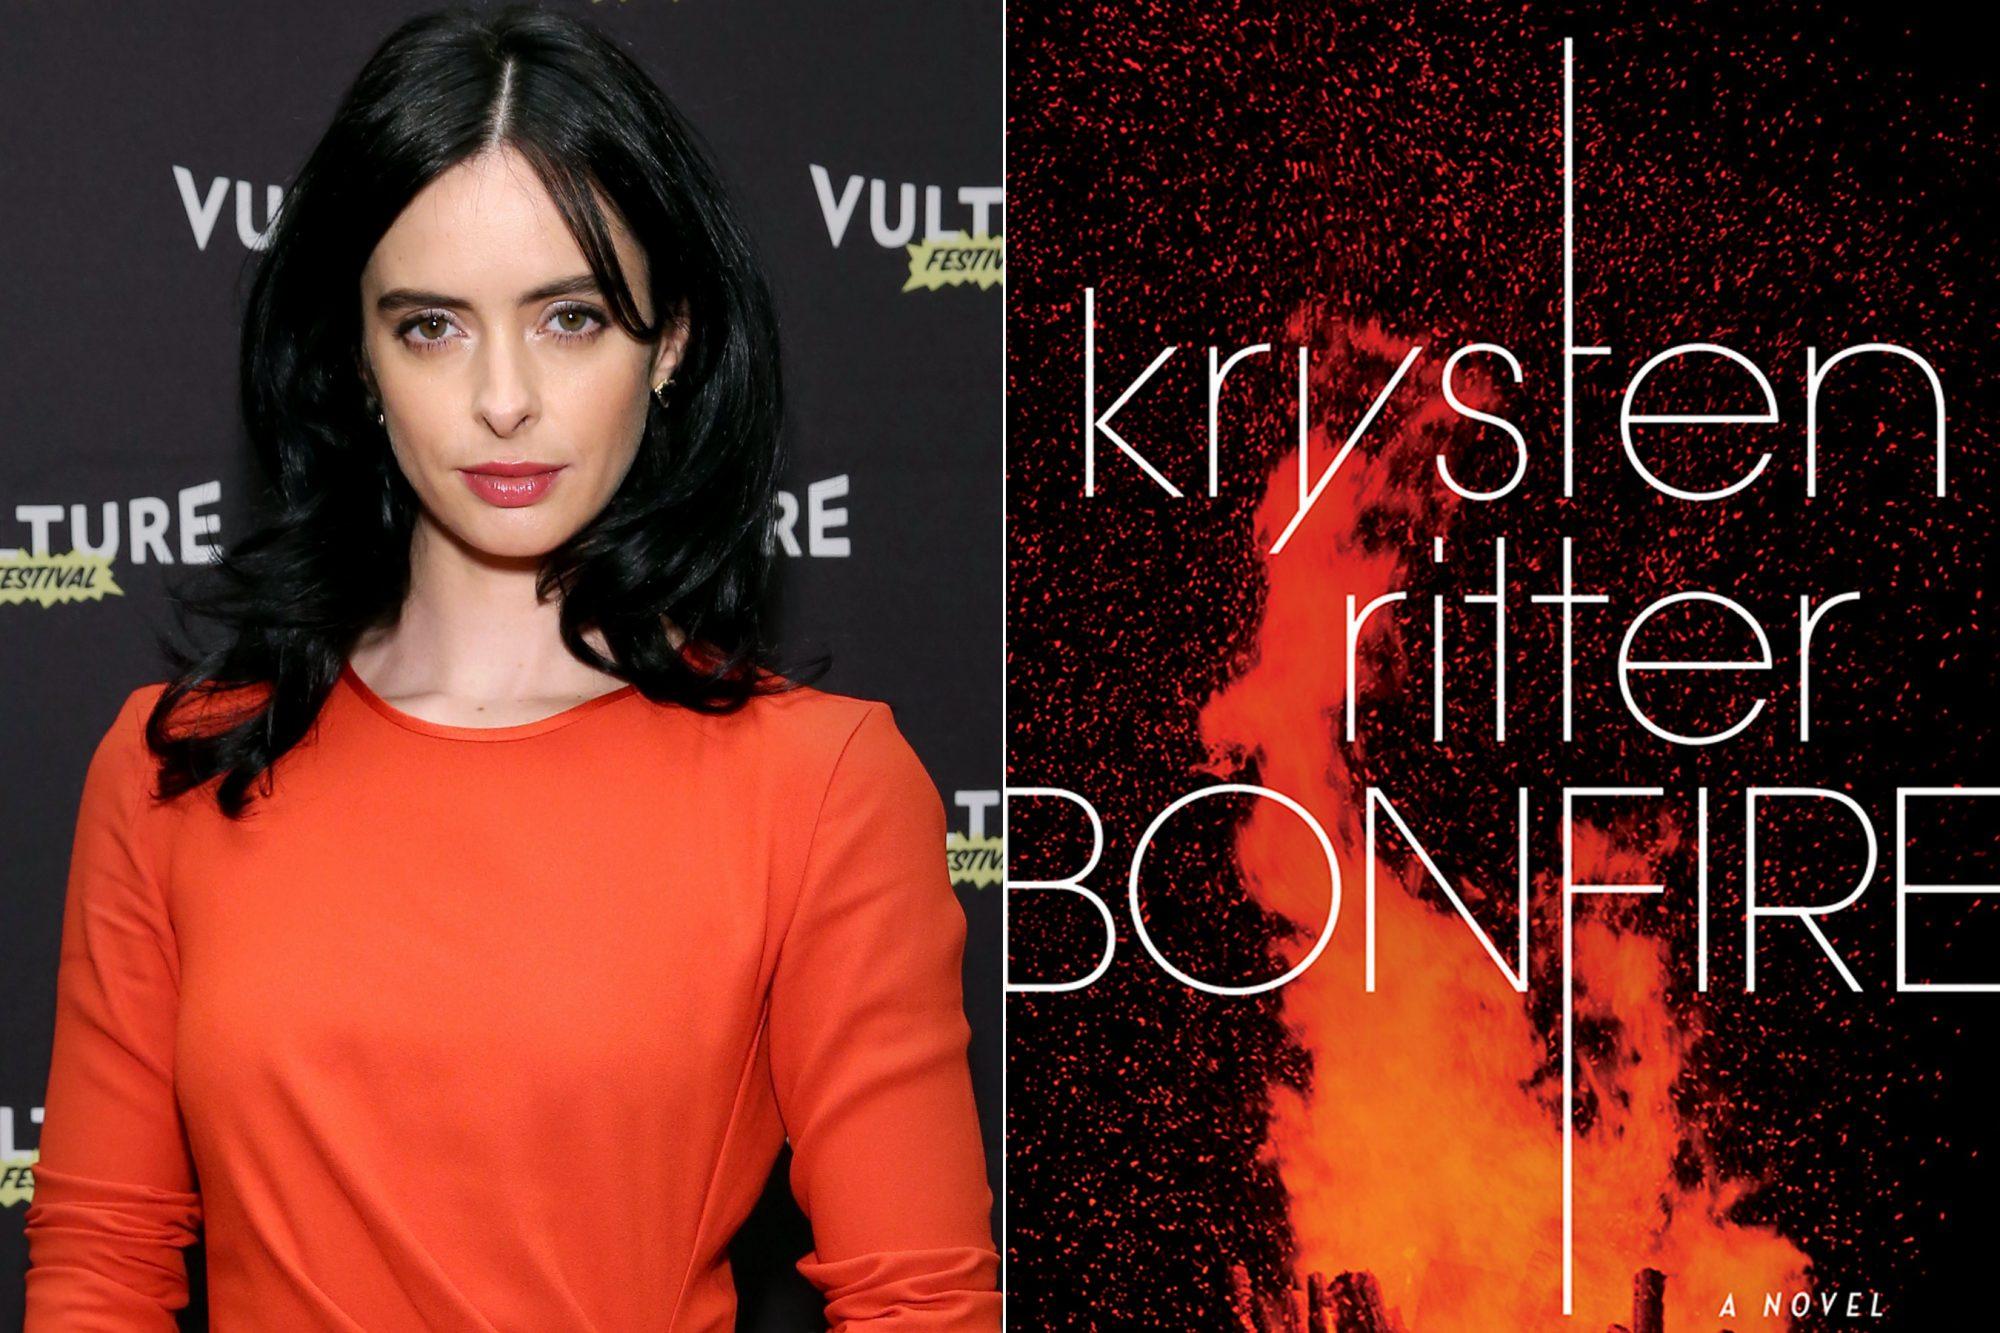 Krysten Ritter / Bonfire